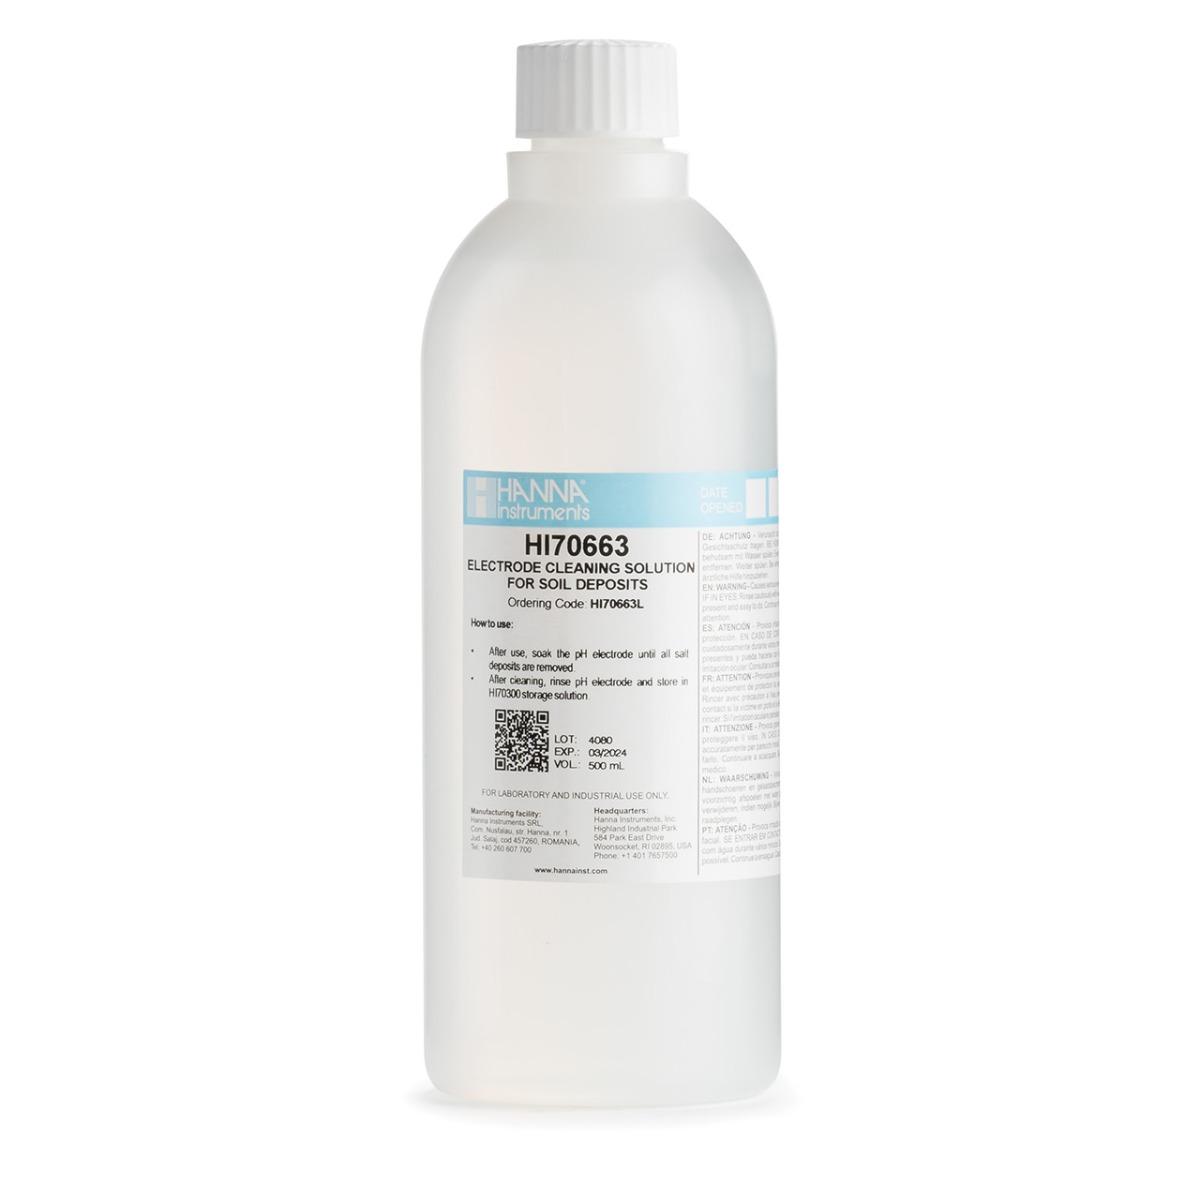 HI70663L Cleaning Solution for Soil Deposits (500 mL)